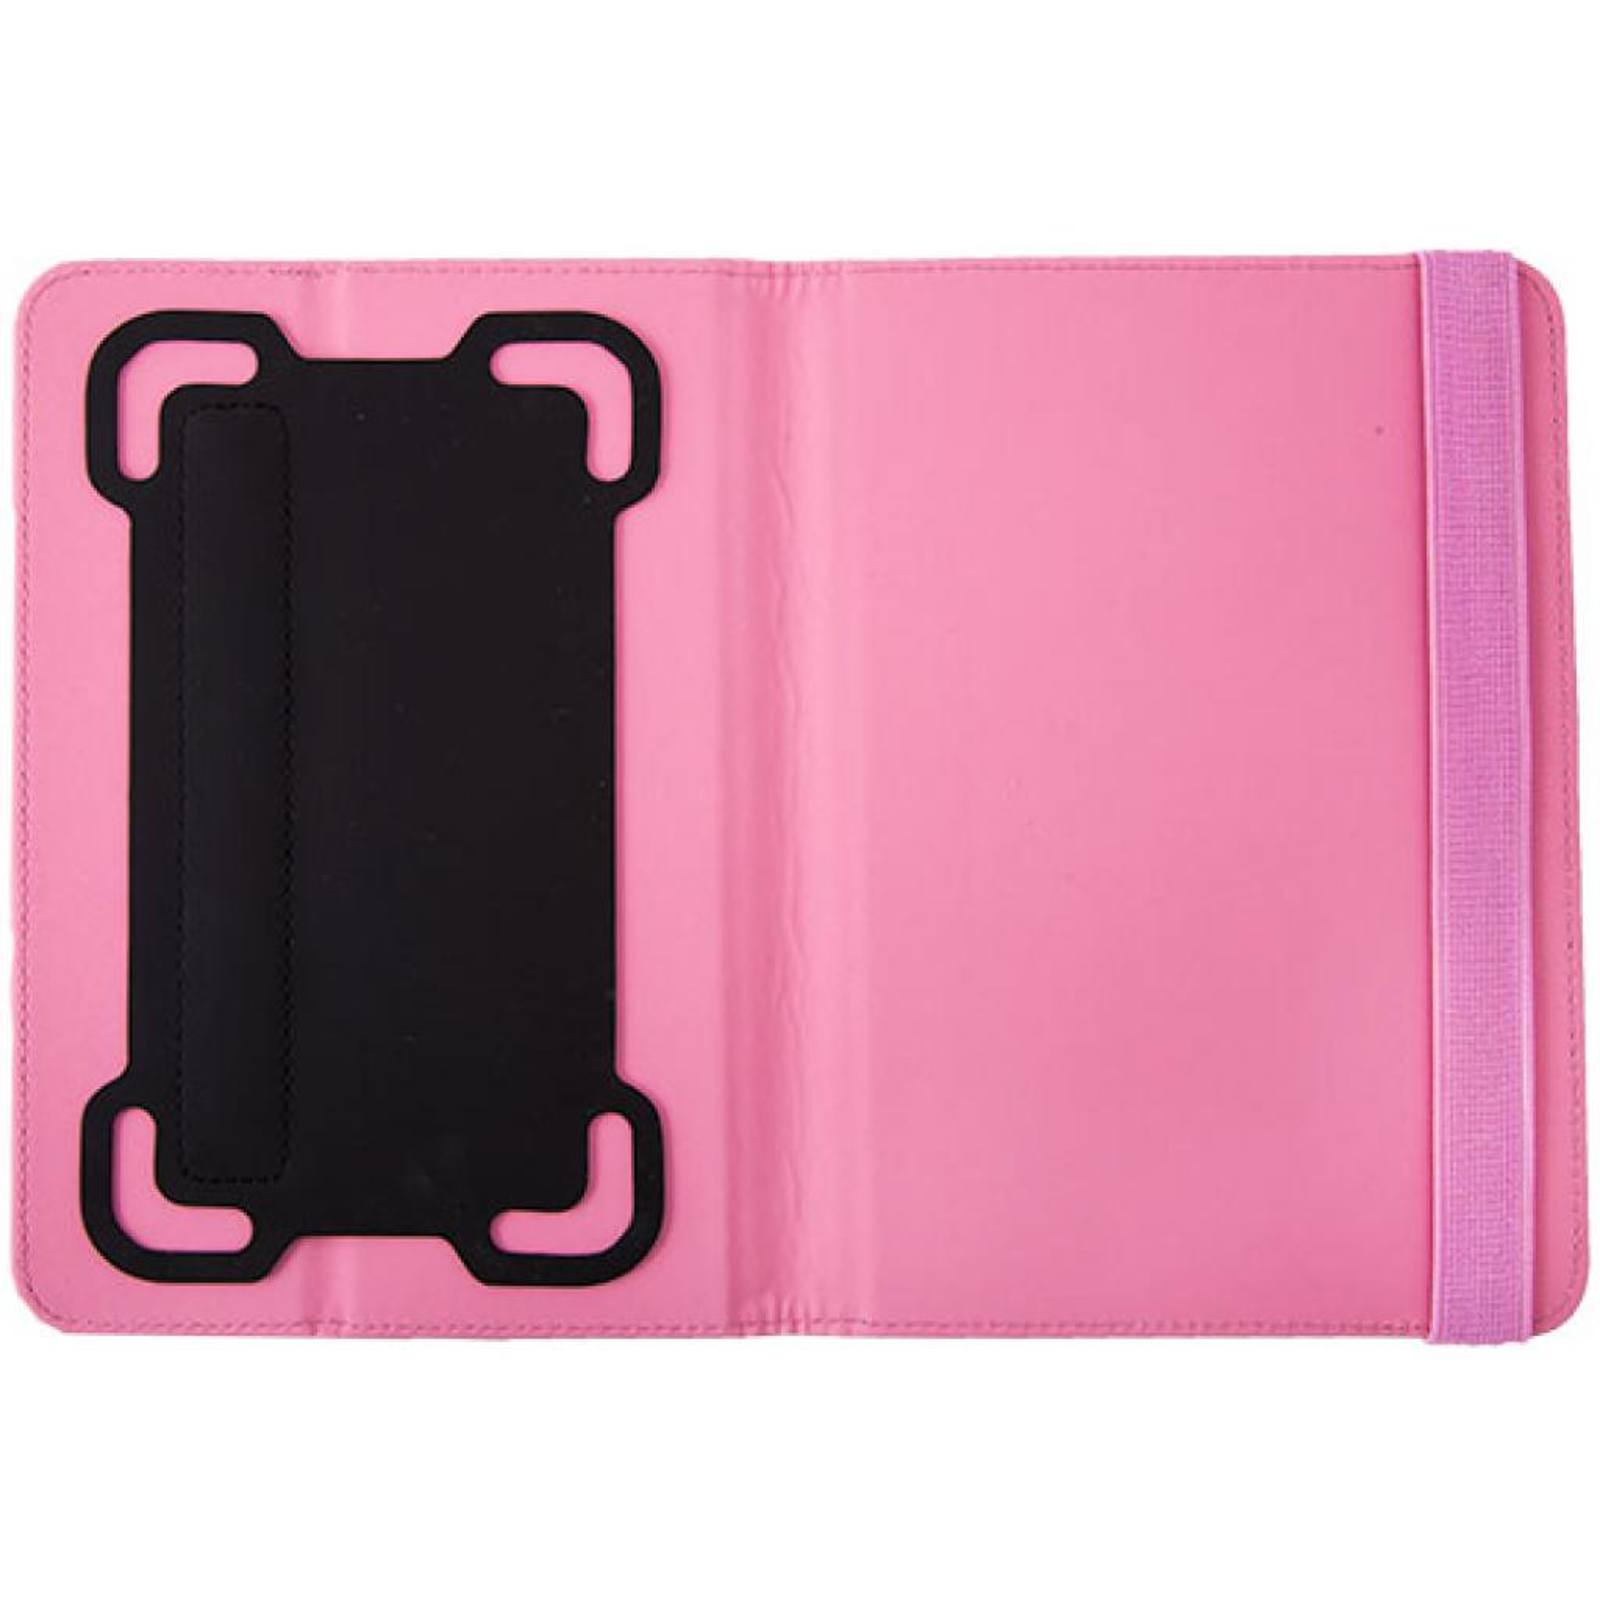 "Чехол для планшета Vellini 7"" Universal stand Pink (216876) изображение 2"